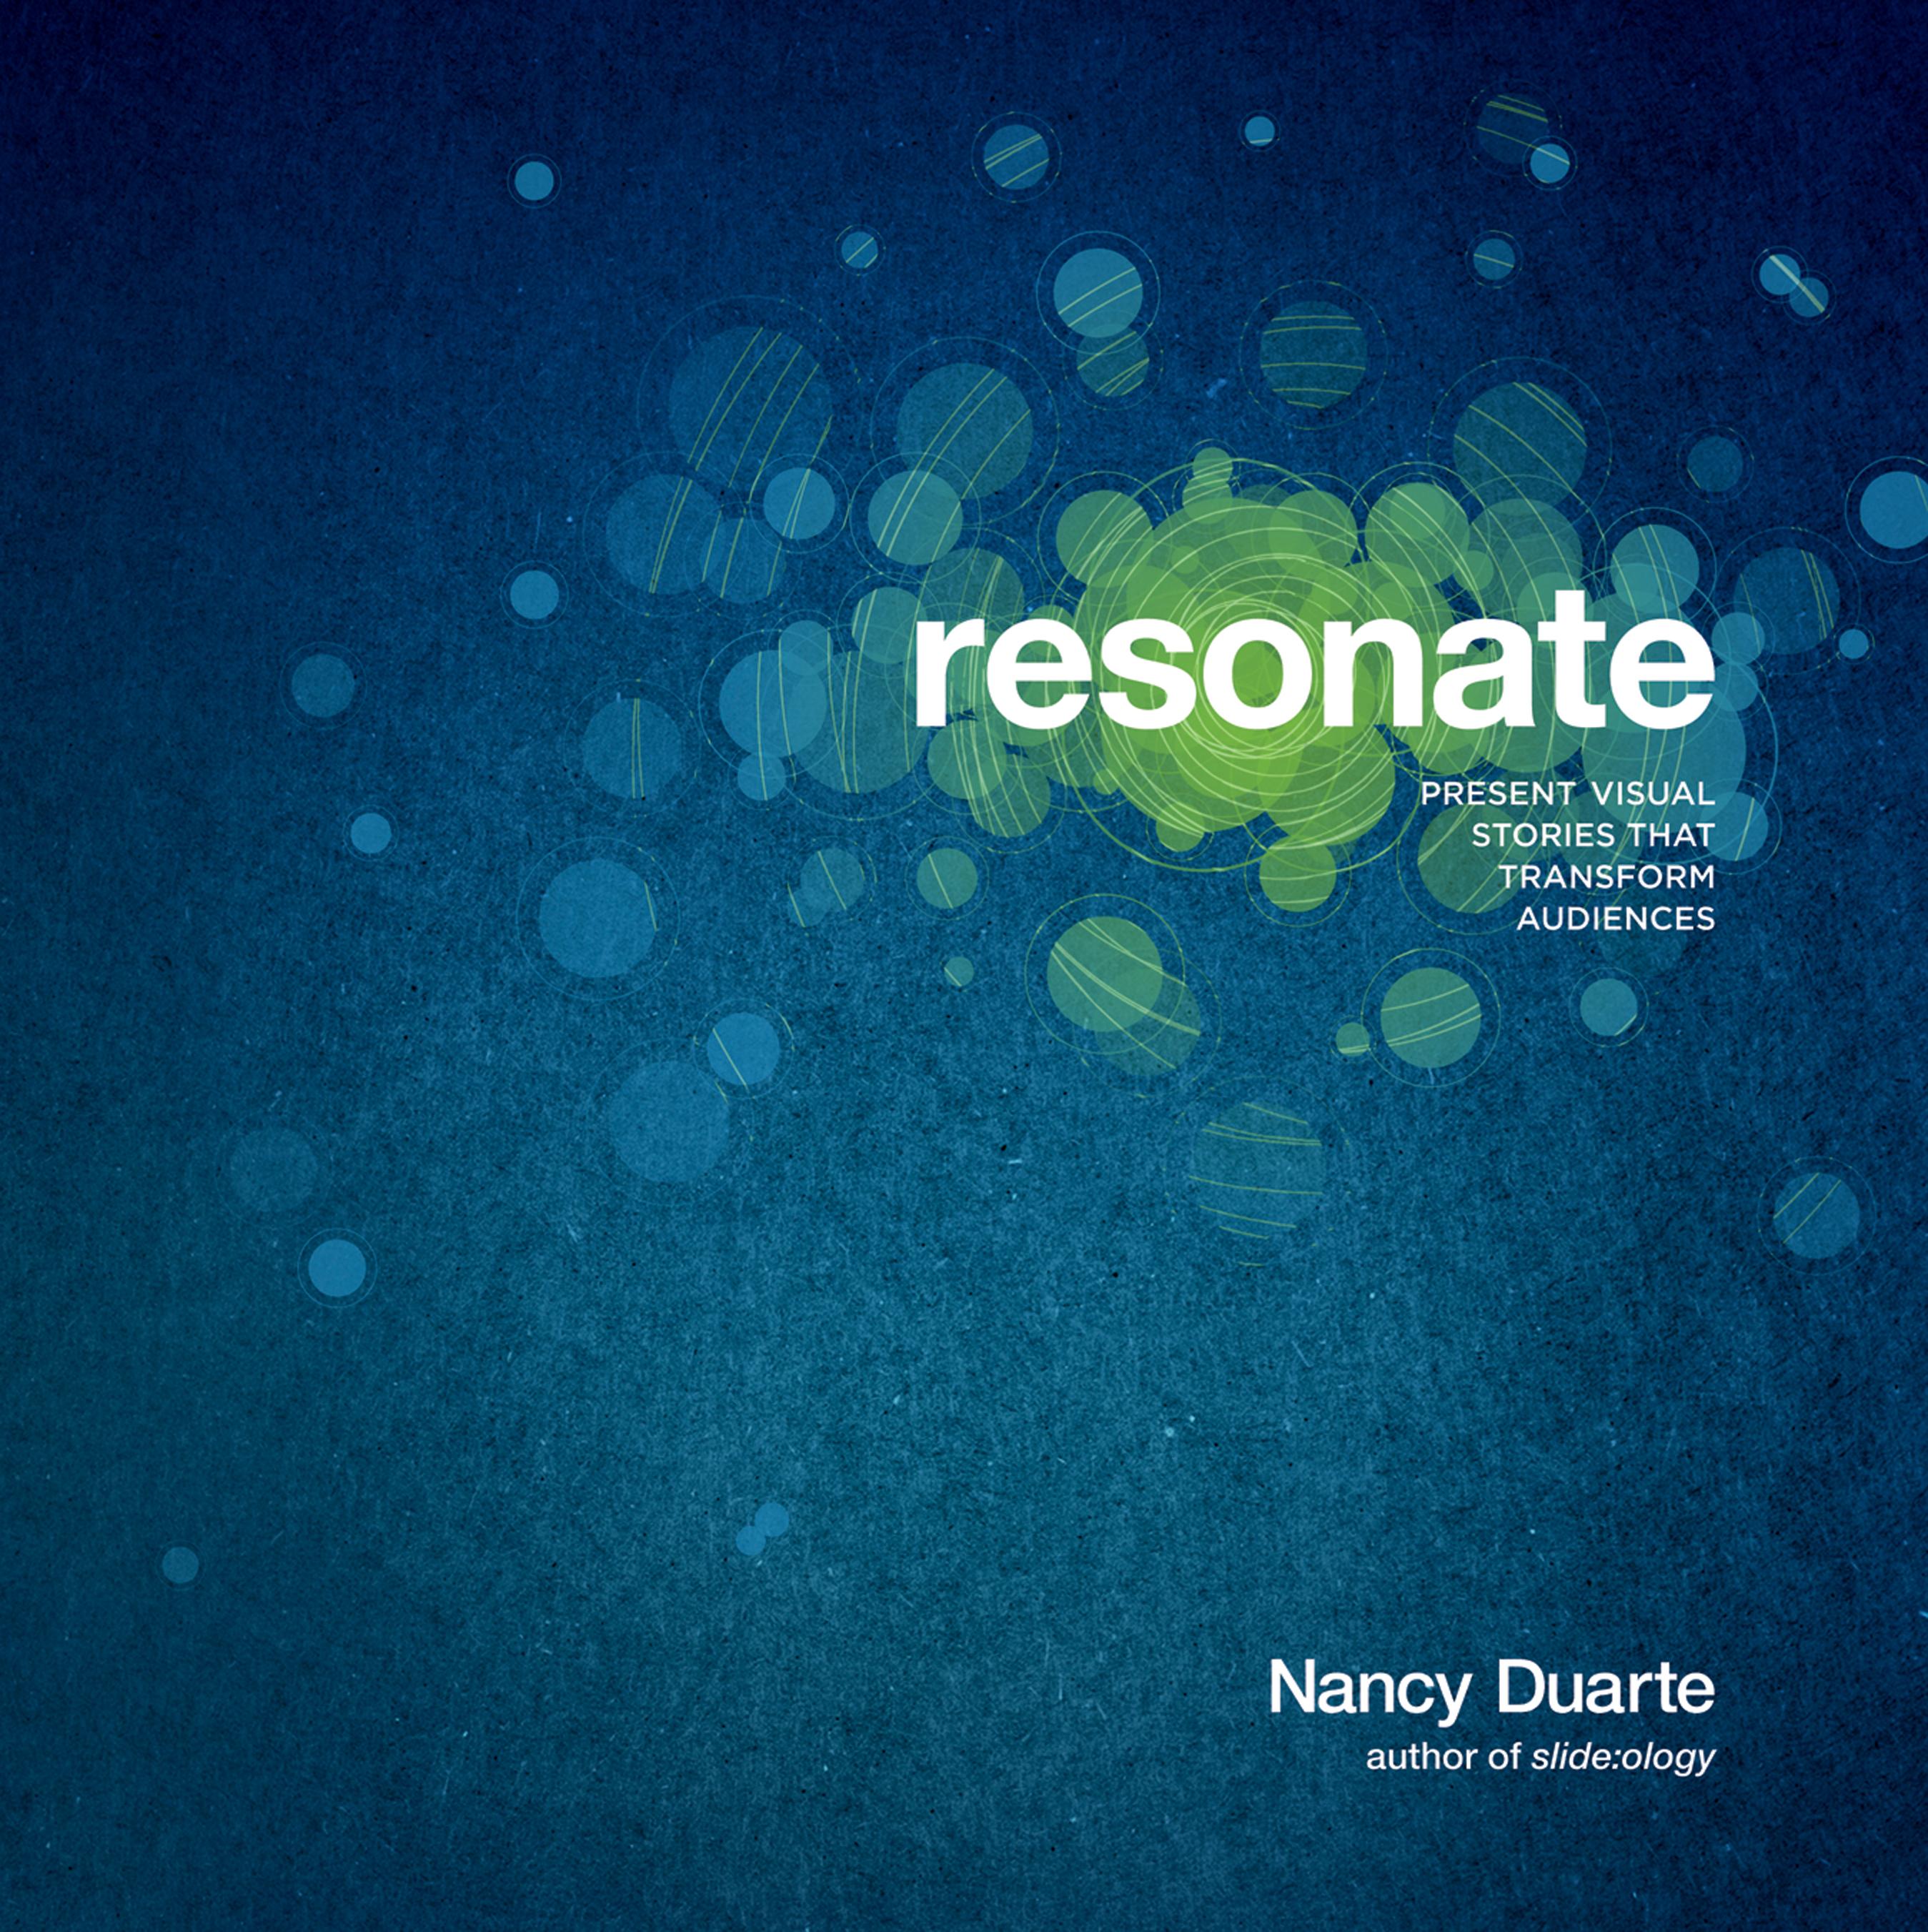 Download Ebook Resonate by Nancy Duarte Pdf